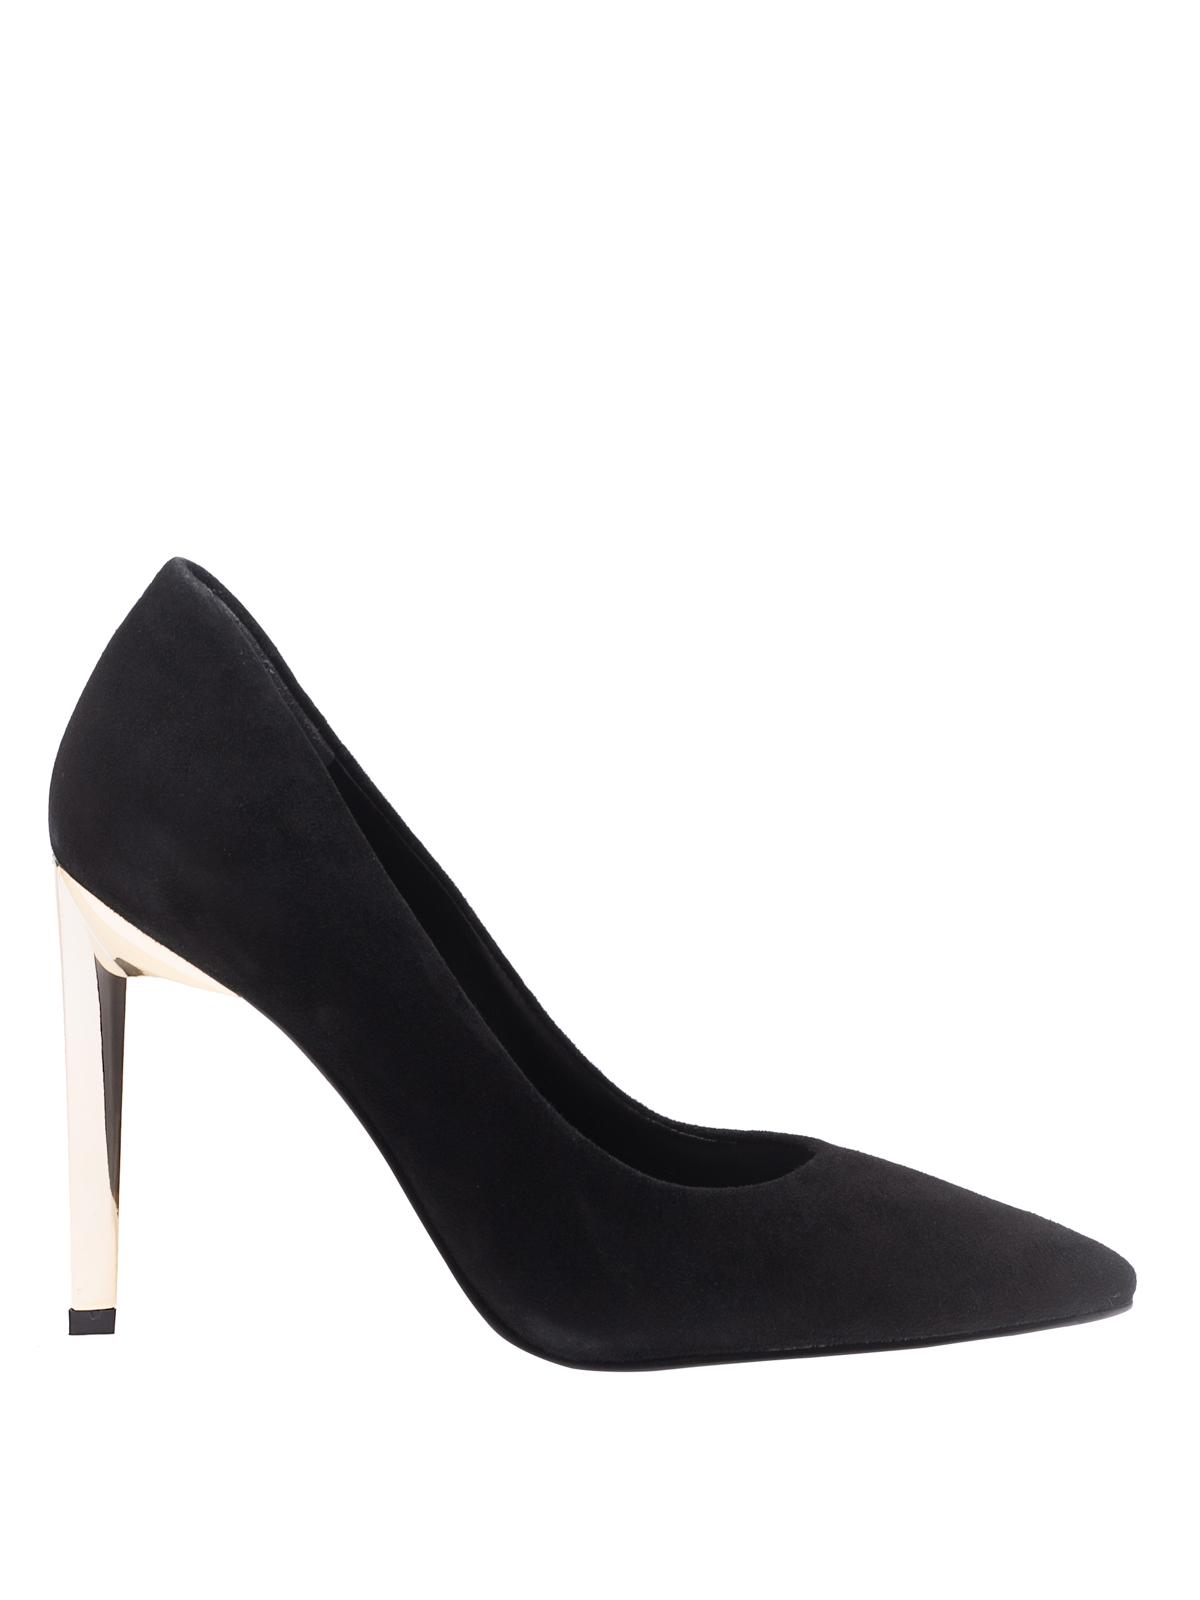 Kendall + Kylie Chaussures À Talon Olivia Escarpins